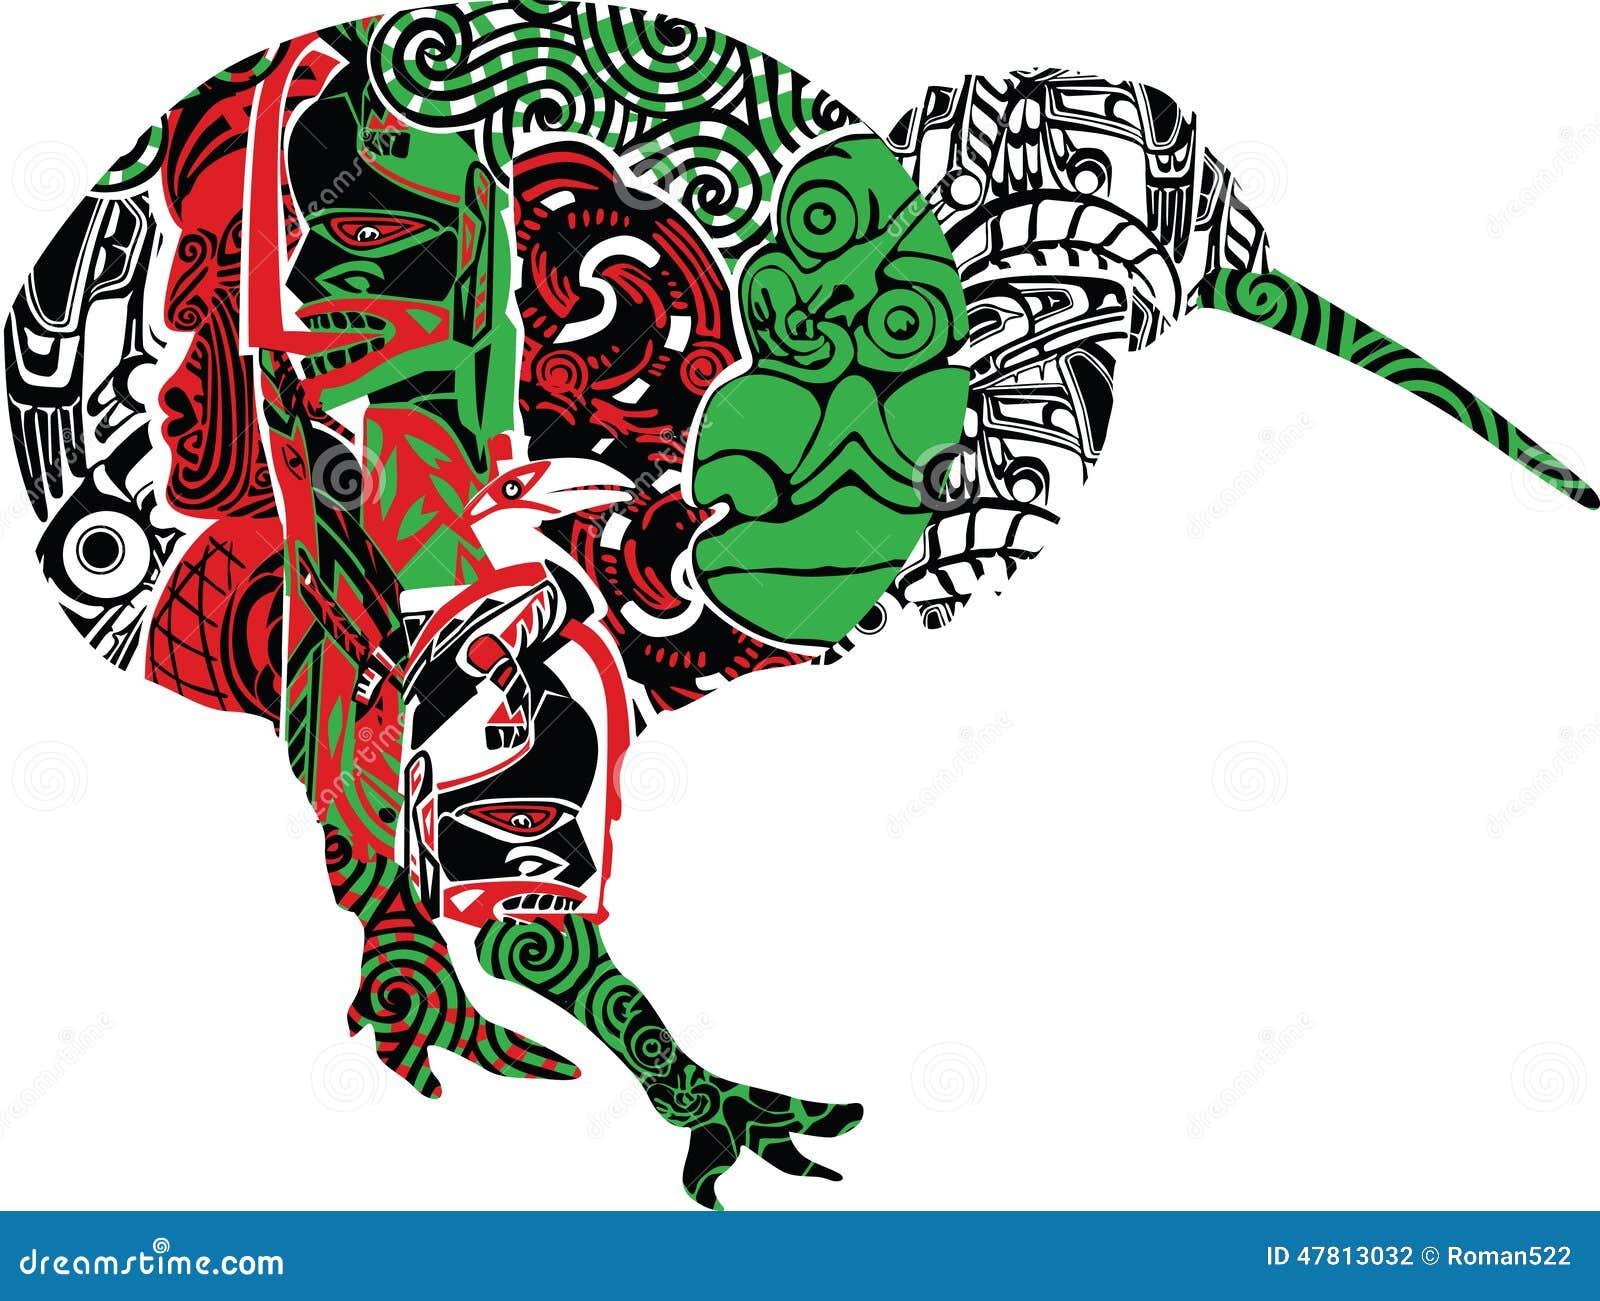 Maori Kiwi Tattoo: Kiwi In The Patterns Stock Vector